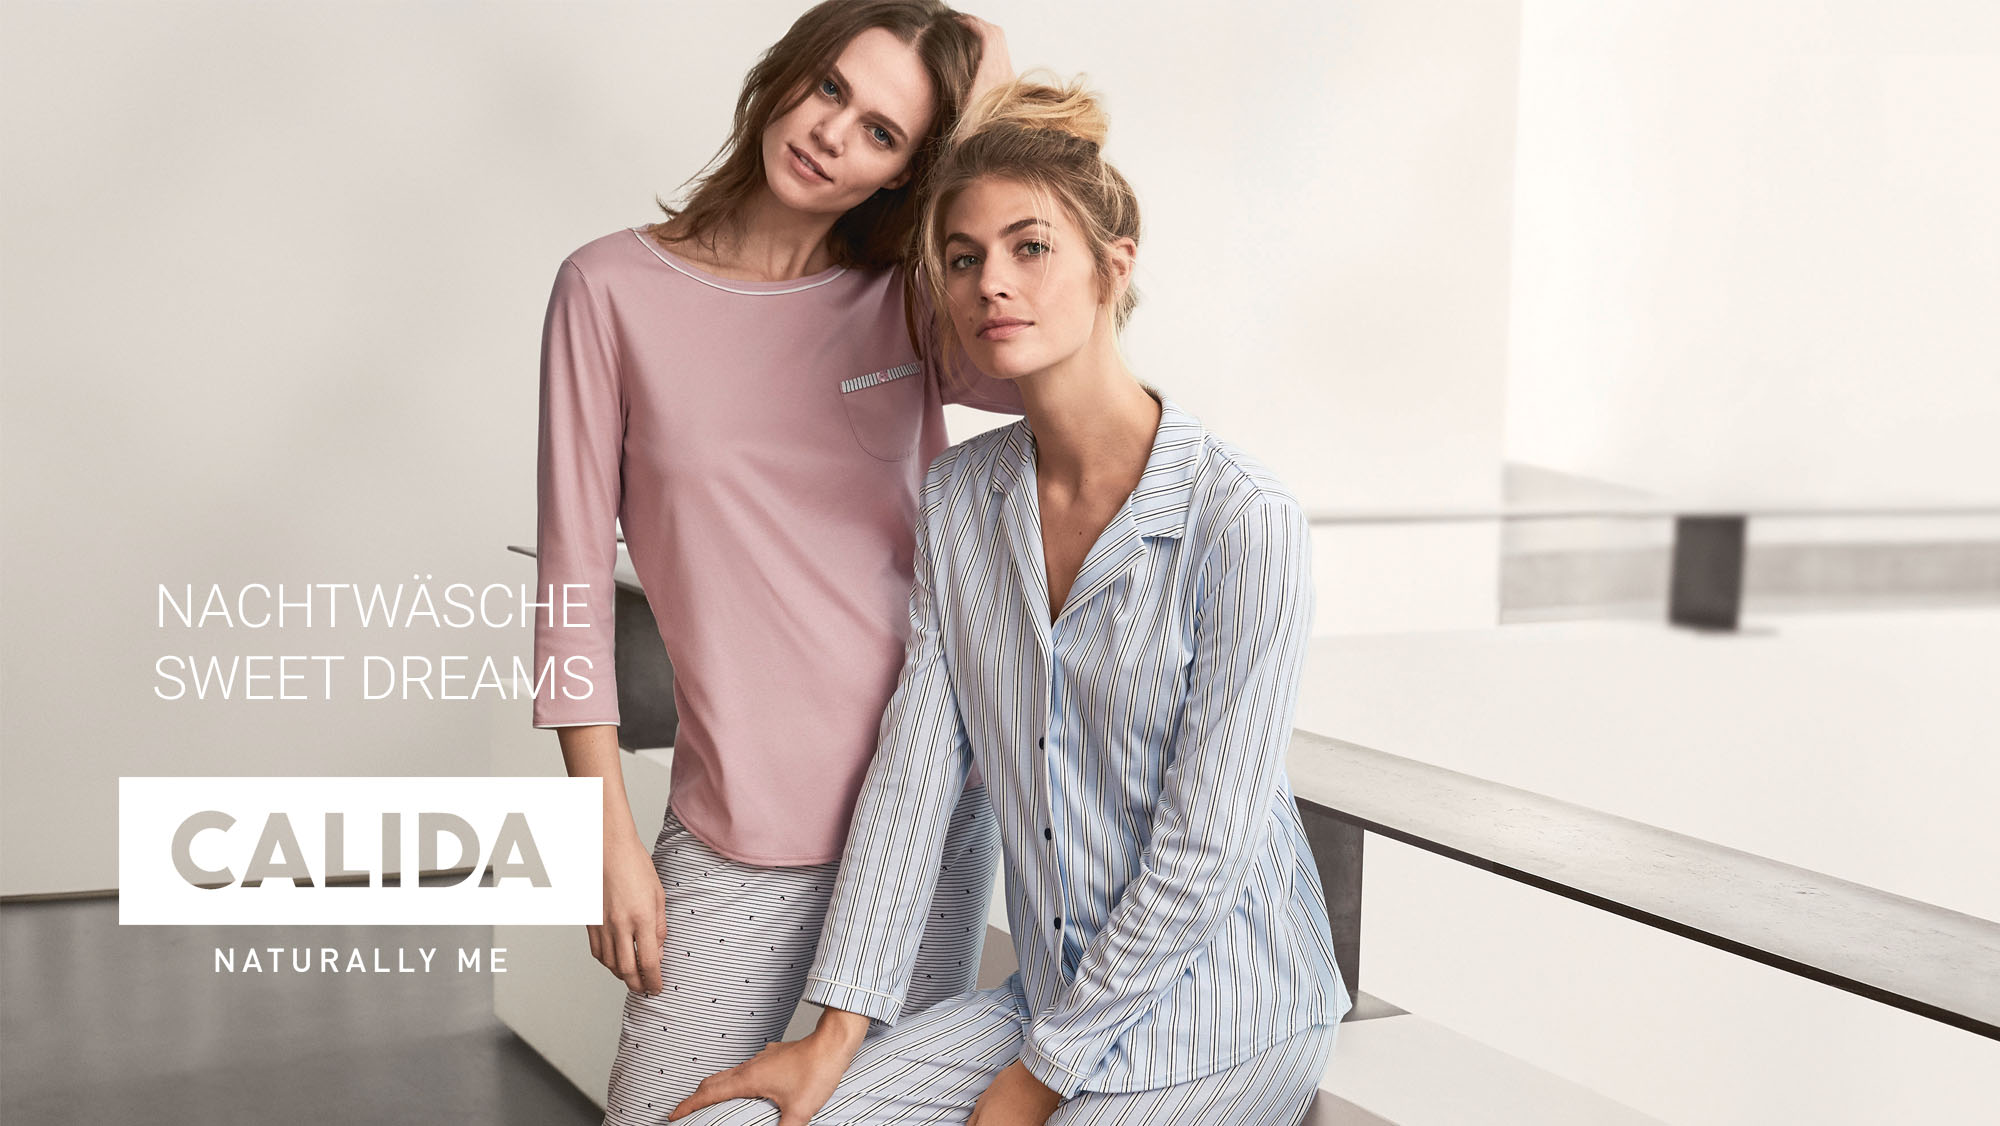 d030a947a2 Calida Wäsche-Shop - portofrei | SUNNY-Dessous